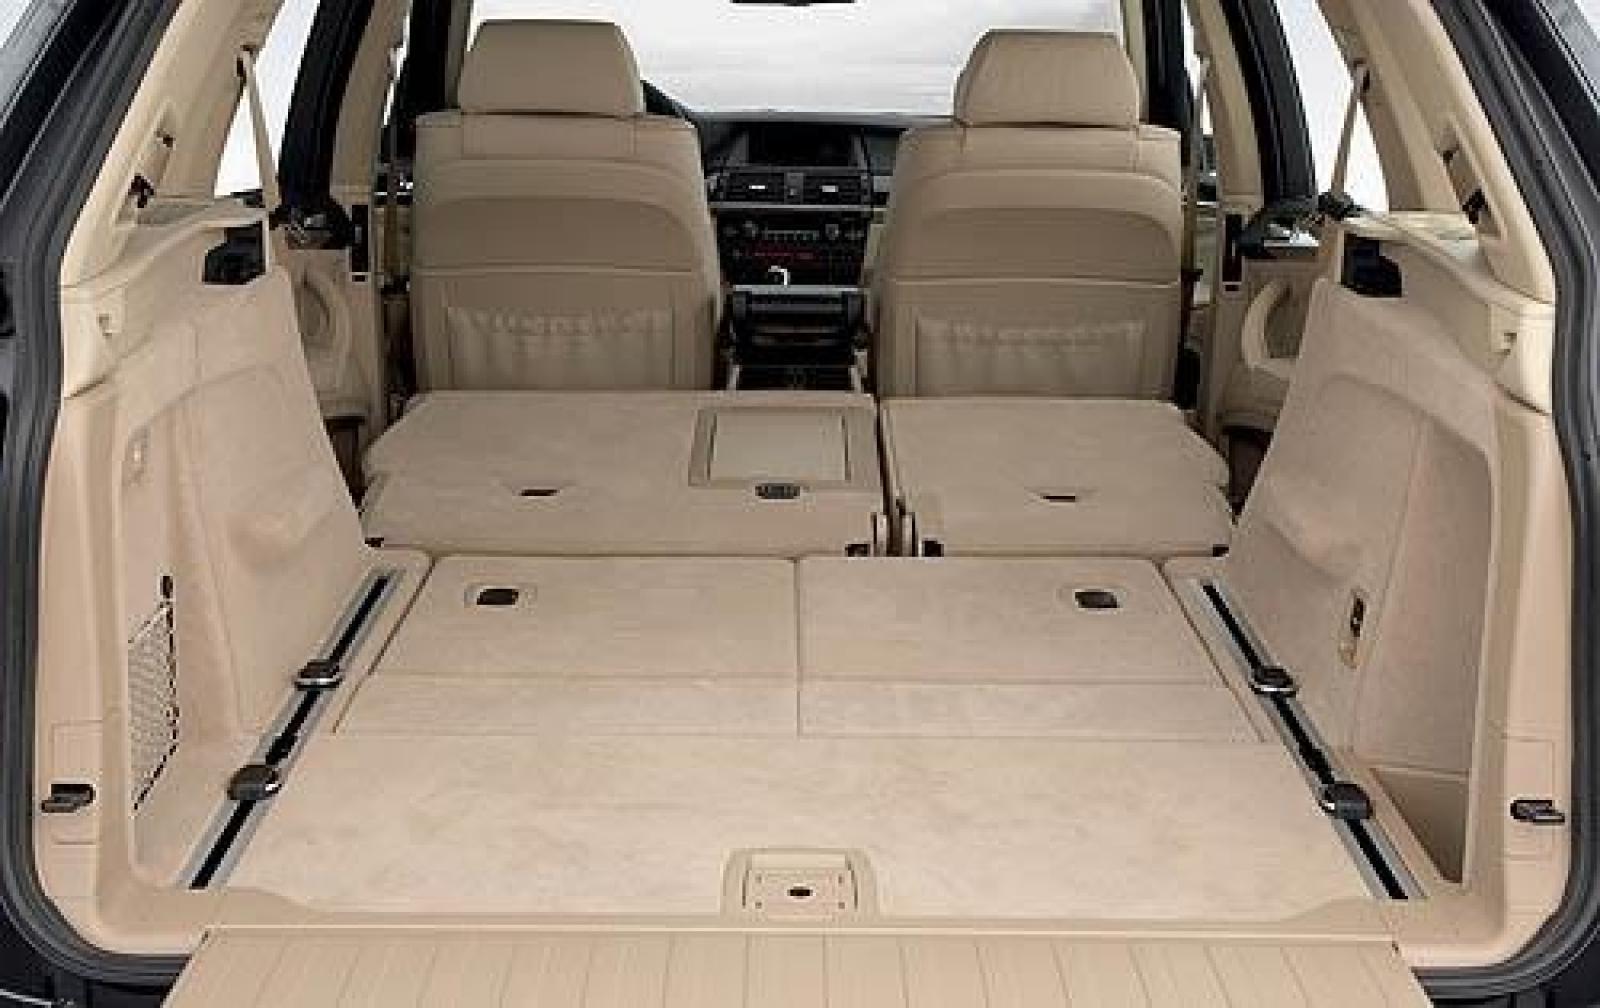 800 1024 1280 1600 Origin 2009 BMW X5